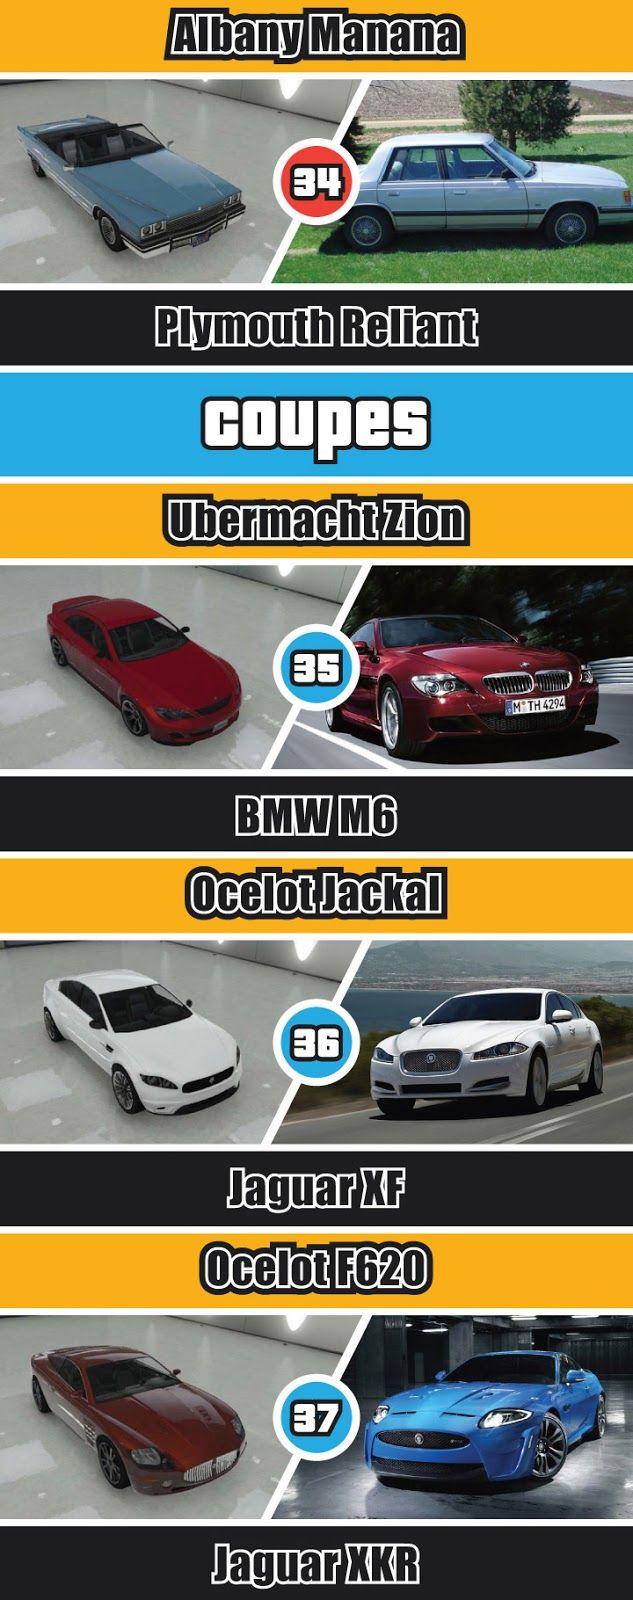 GTA-V-REAL-LIFE-CARS 37 is actually a Maserati GranTurismo